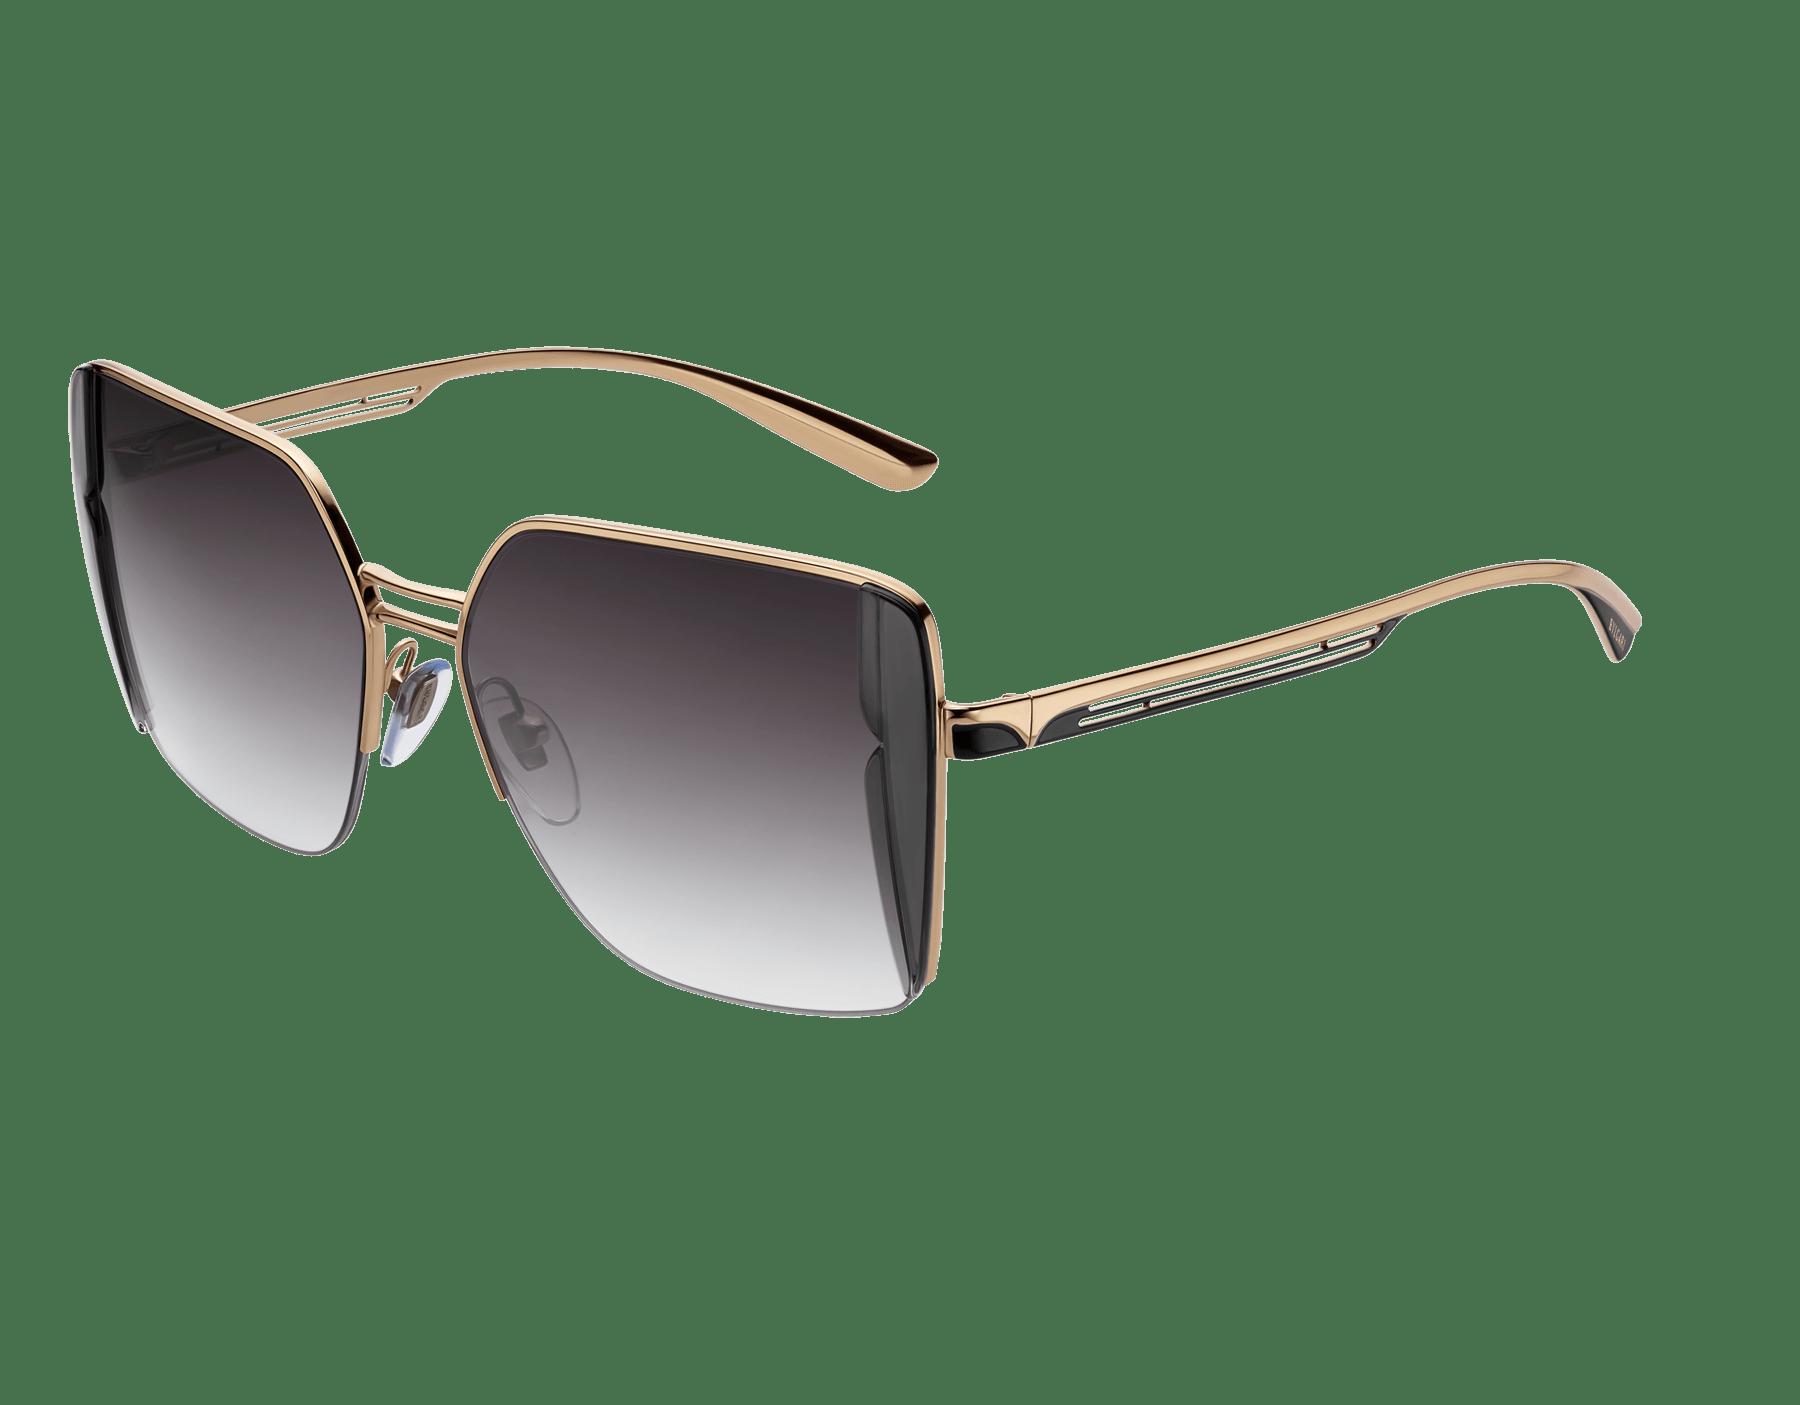 Bulgari B.zero1 B.purebright metal squared sunglasses. 903960 image 1